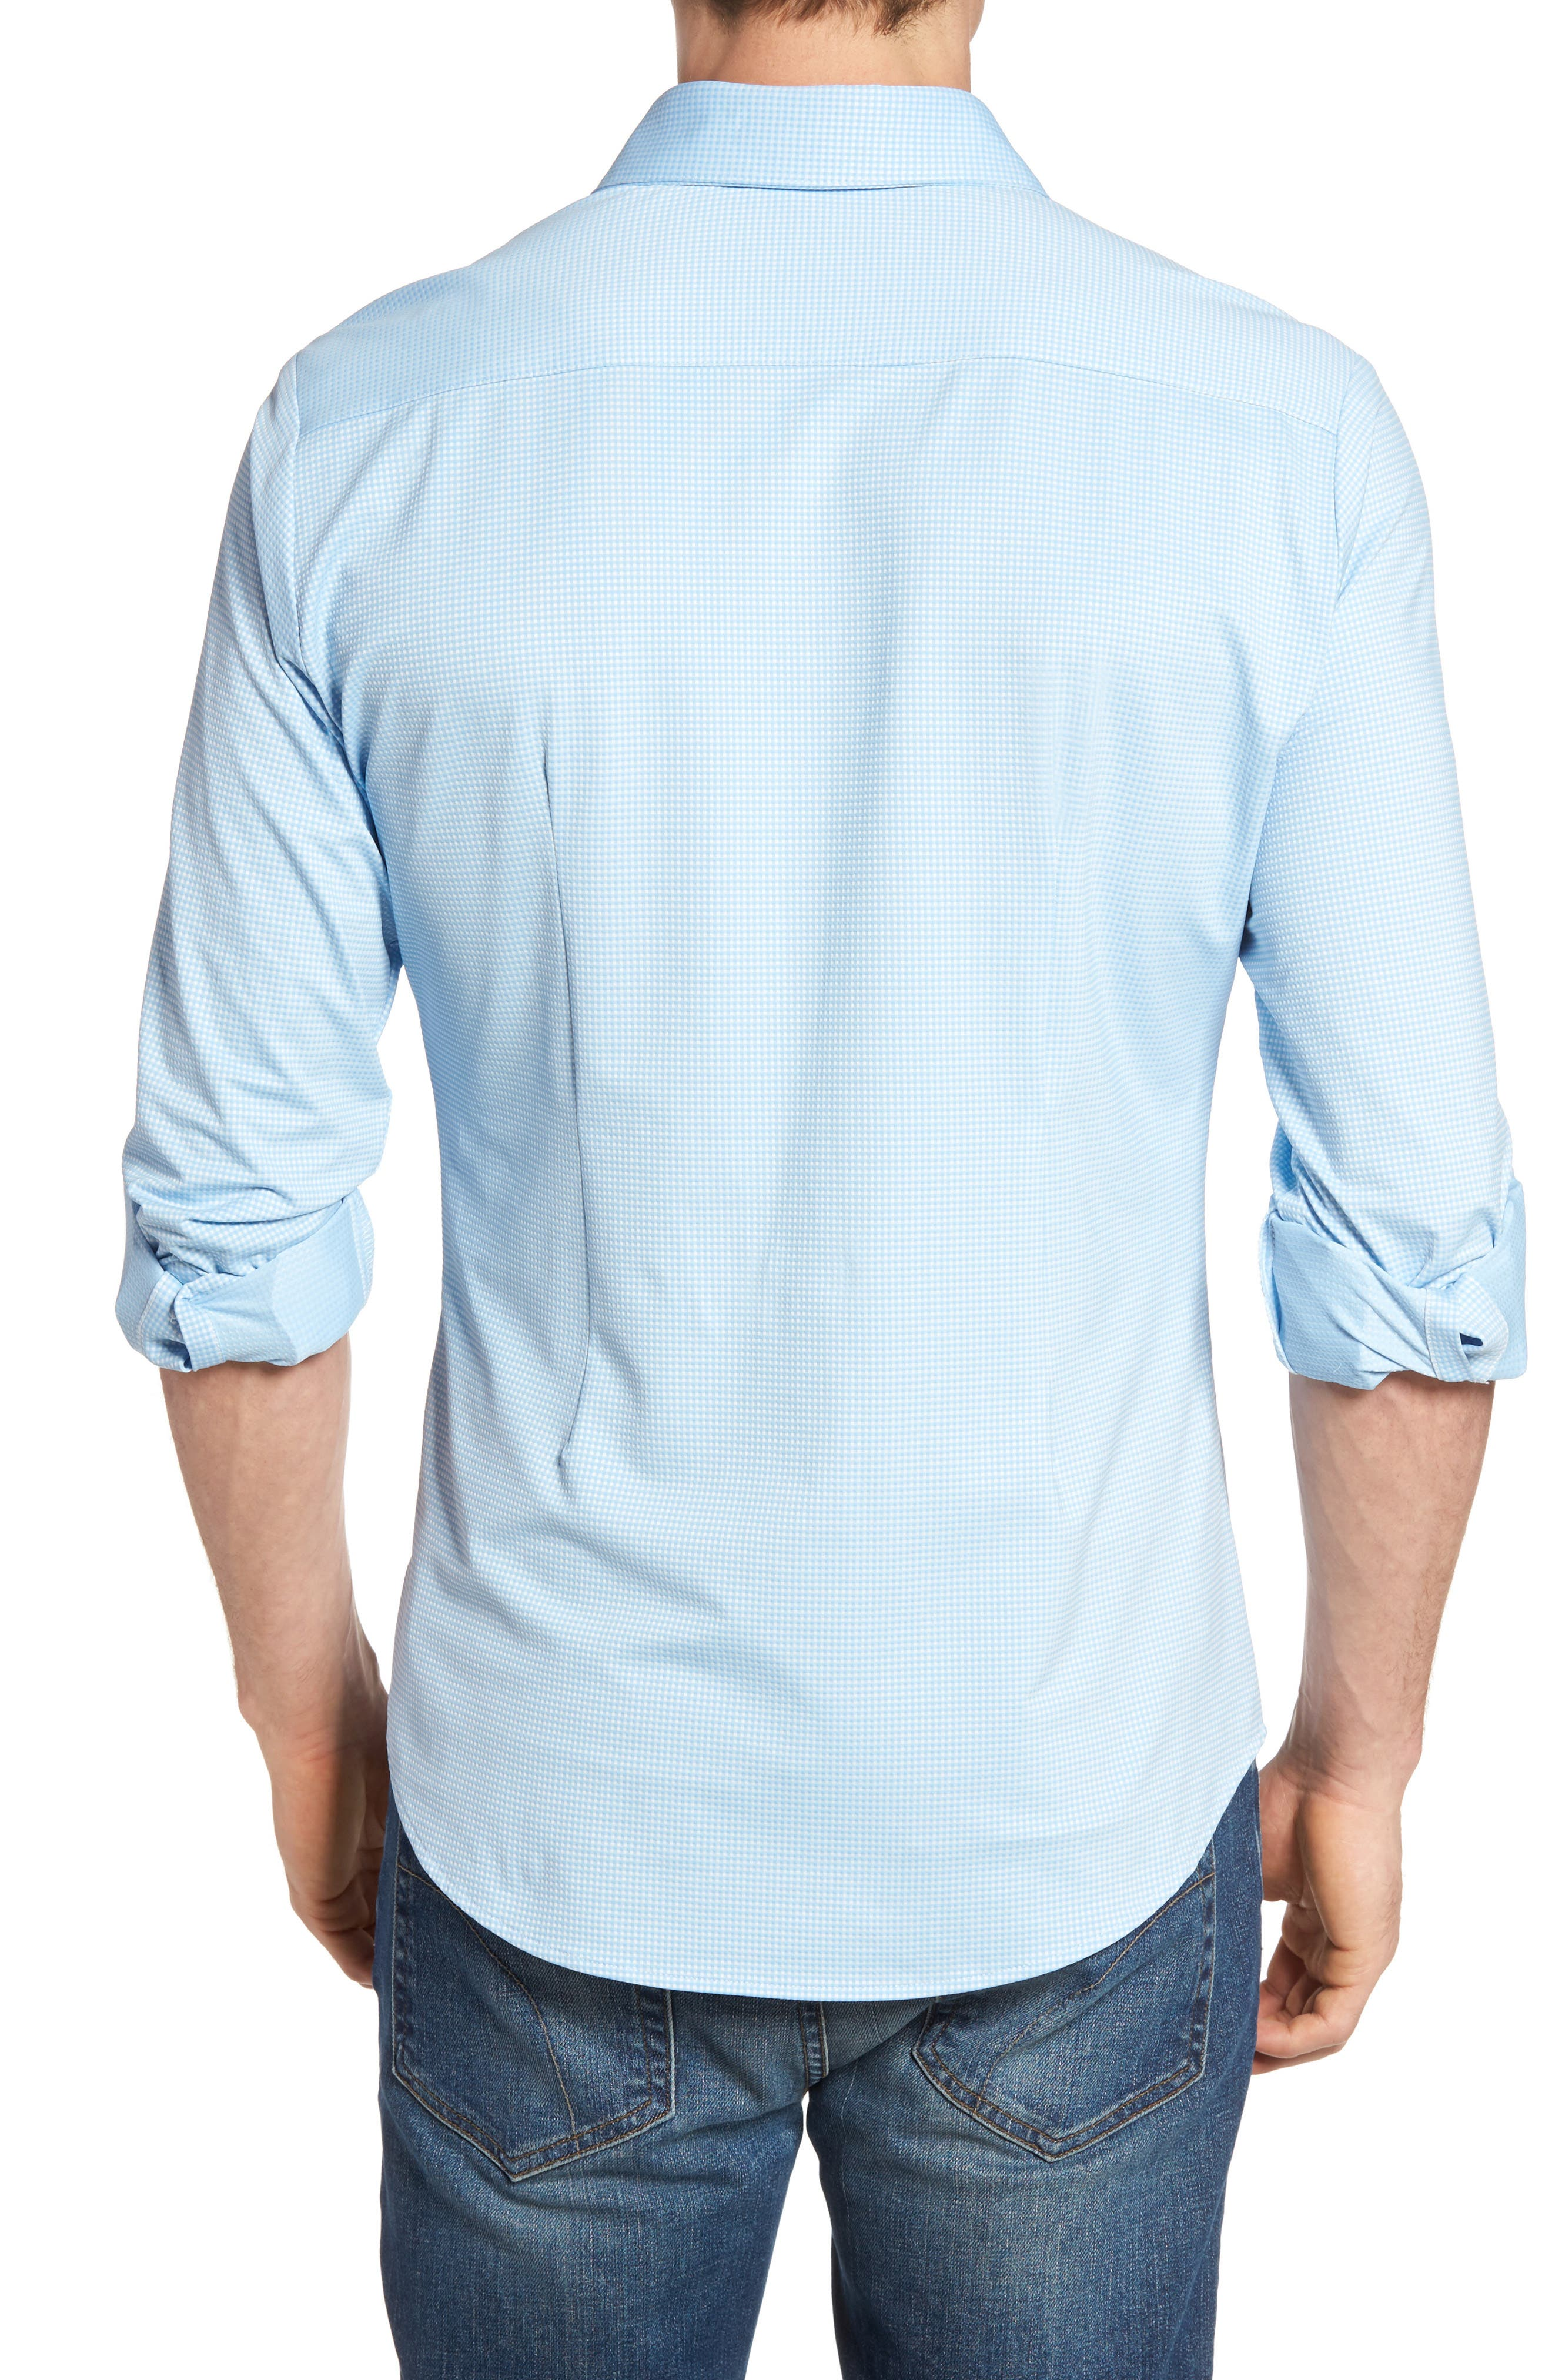 MIZZEN+MAIN, Whitman Trim Fit Dobby Gingham Performance Sport Shirt, Alternate thumbnail 2, color, BLUE